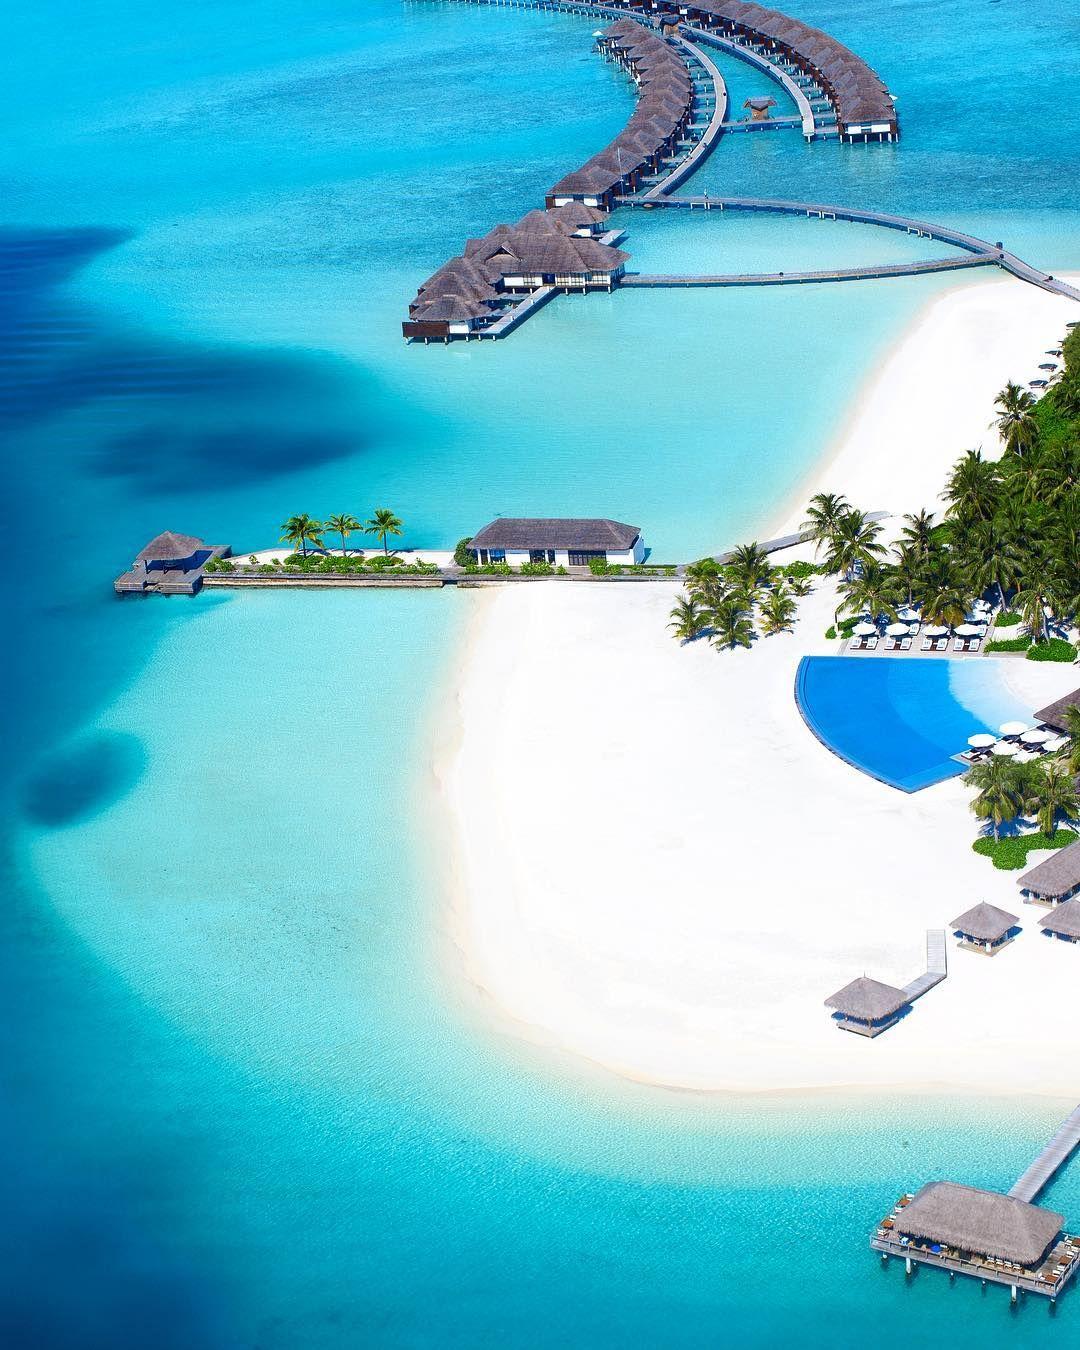 Maldives Image By ISLAND GIRL On BEACH HOUSE/ COSTAL